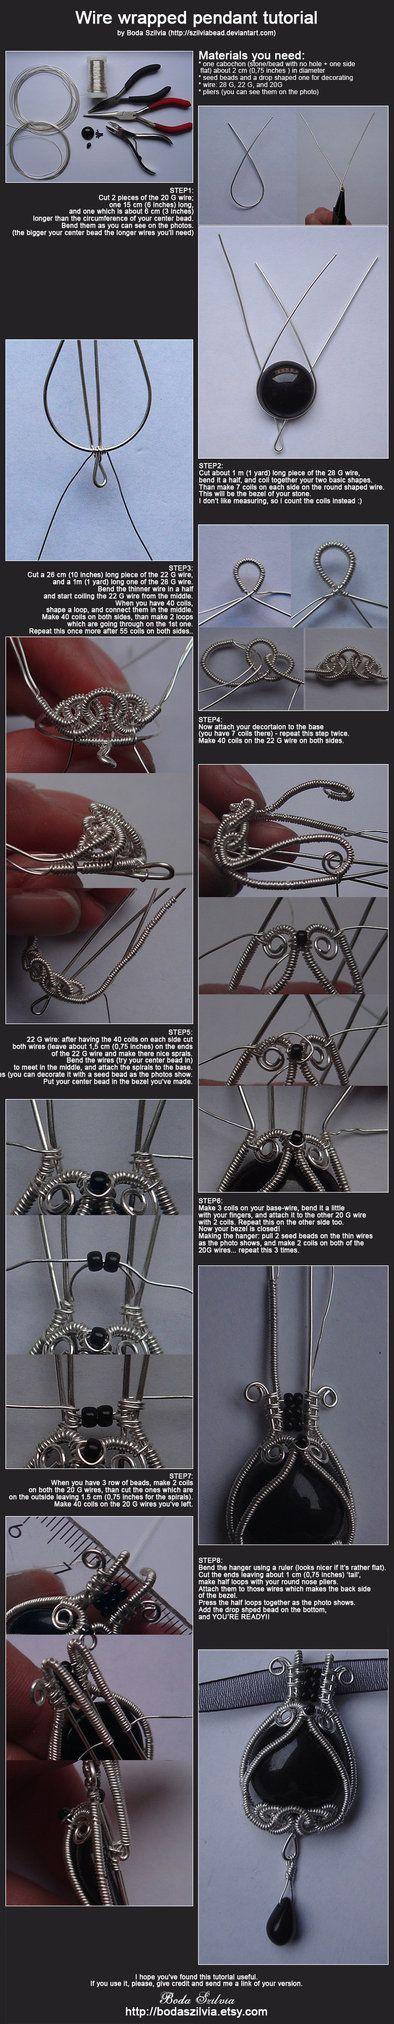 Wire Wrapped Pendant Tutorial : DeviantART by bodaszilvia